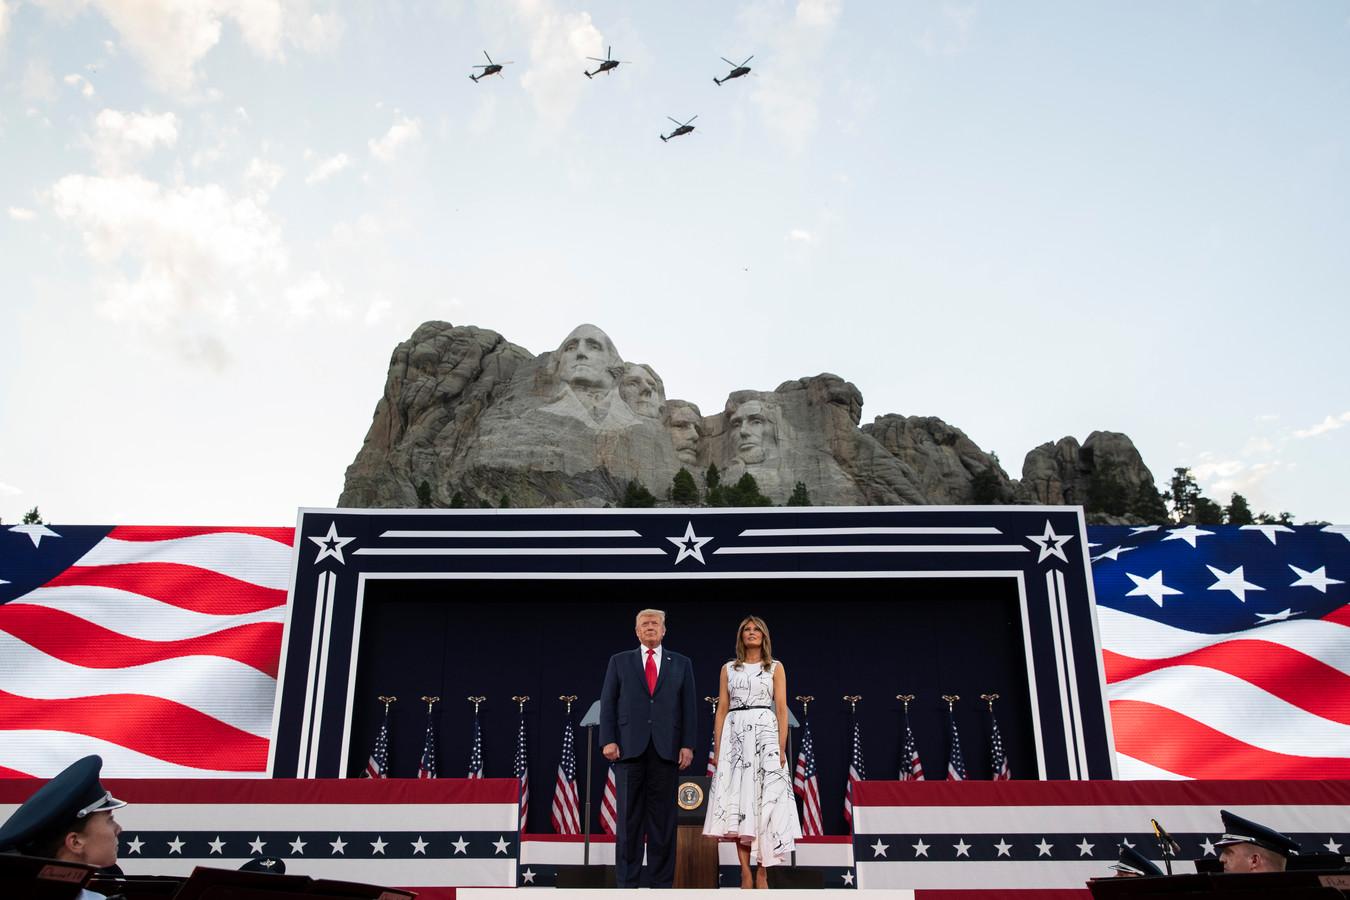 President Donald Trump met first lady Melania Trump bij Mount Rushmore.